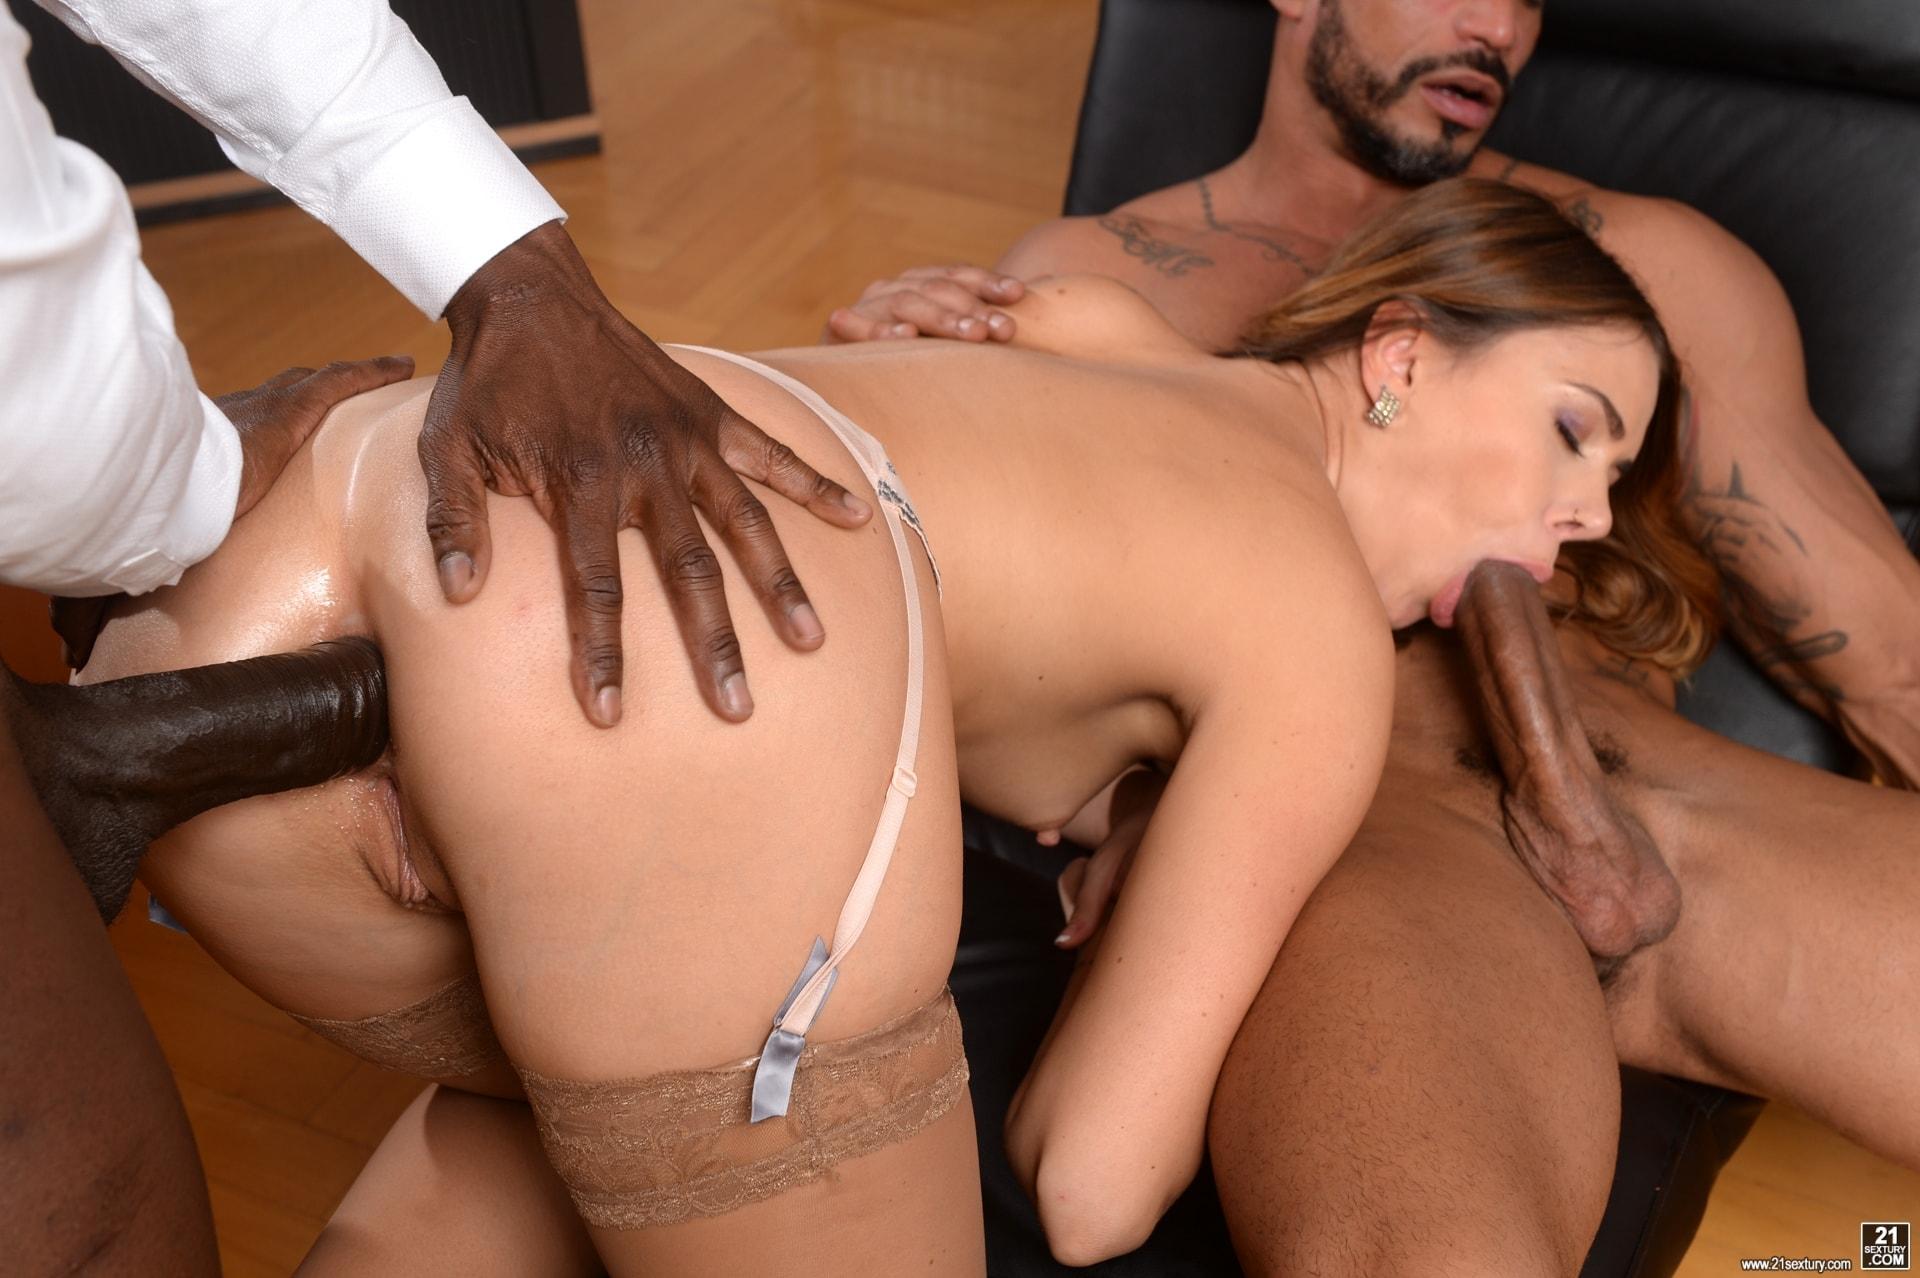 21Sextury 'My Bosses DP'd Me At Work' starring Ani Black Fox (Photo 165)